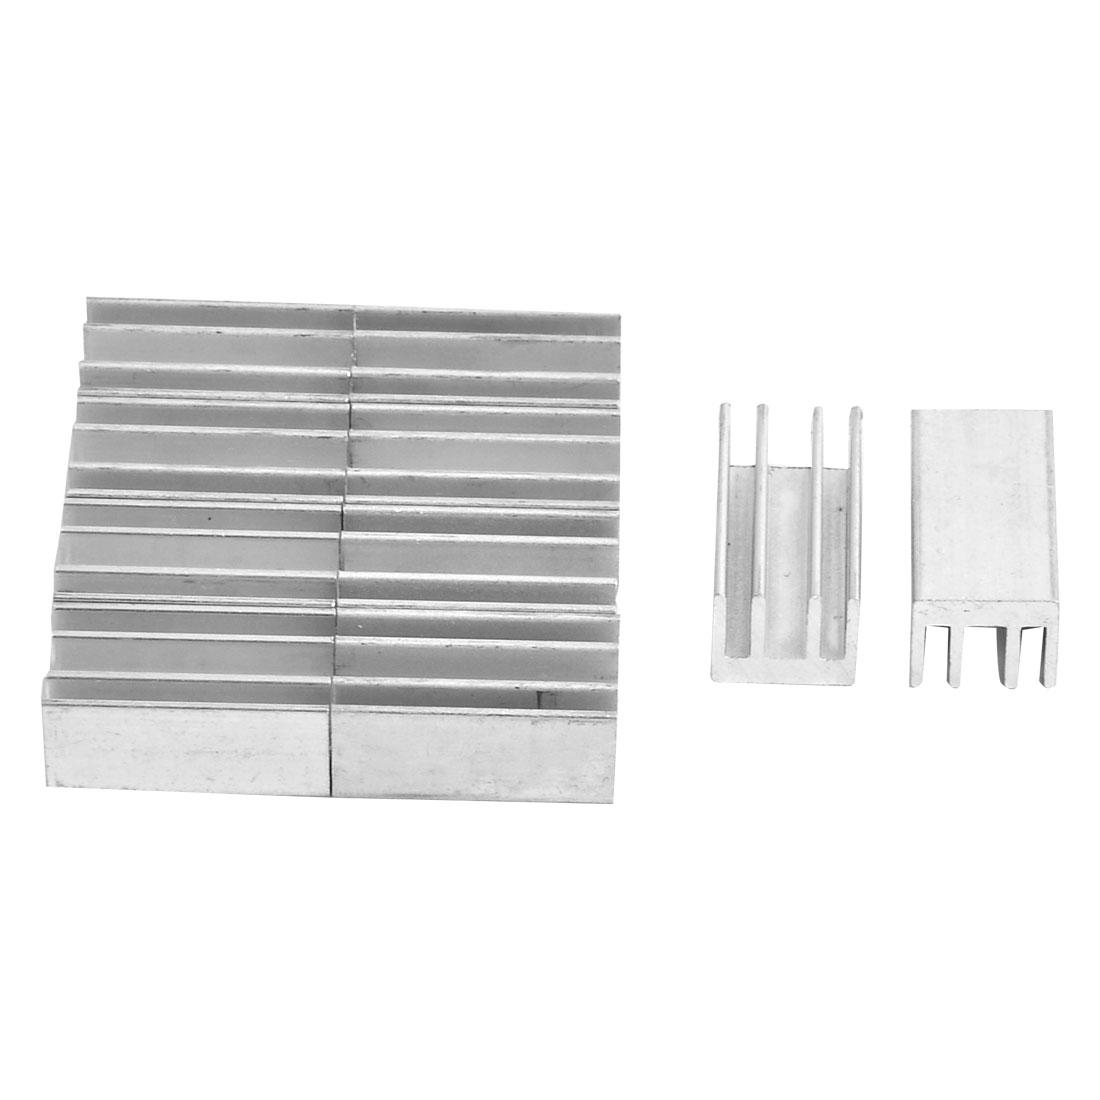 Aluminium Heatsink Cooling Fin Cooler Silver Tone 25mm x 13mm x 11mm 10 Pcs